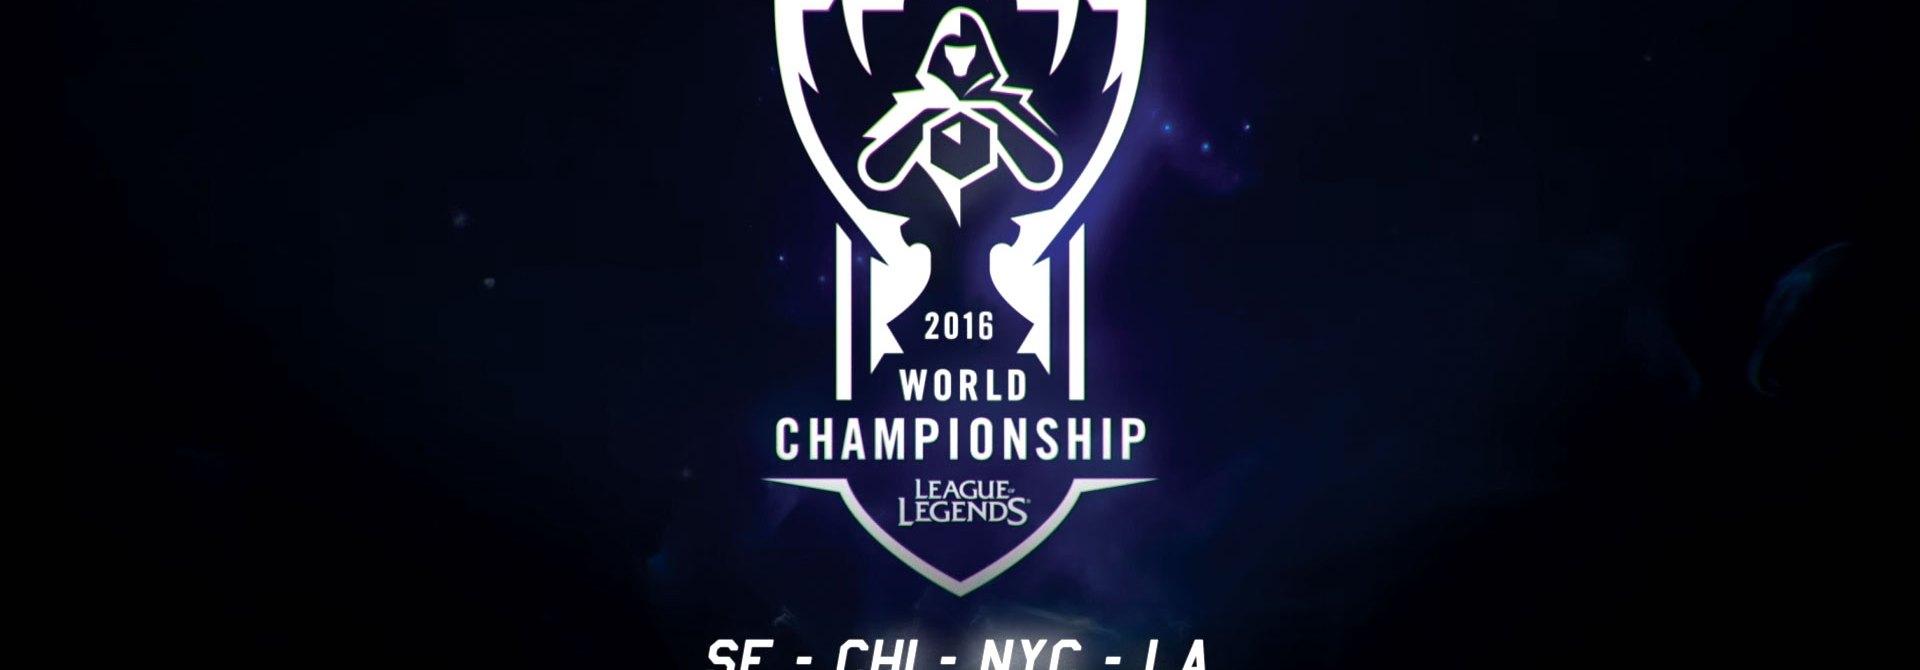 League of Legends 2016 World Championship